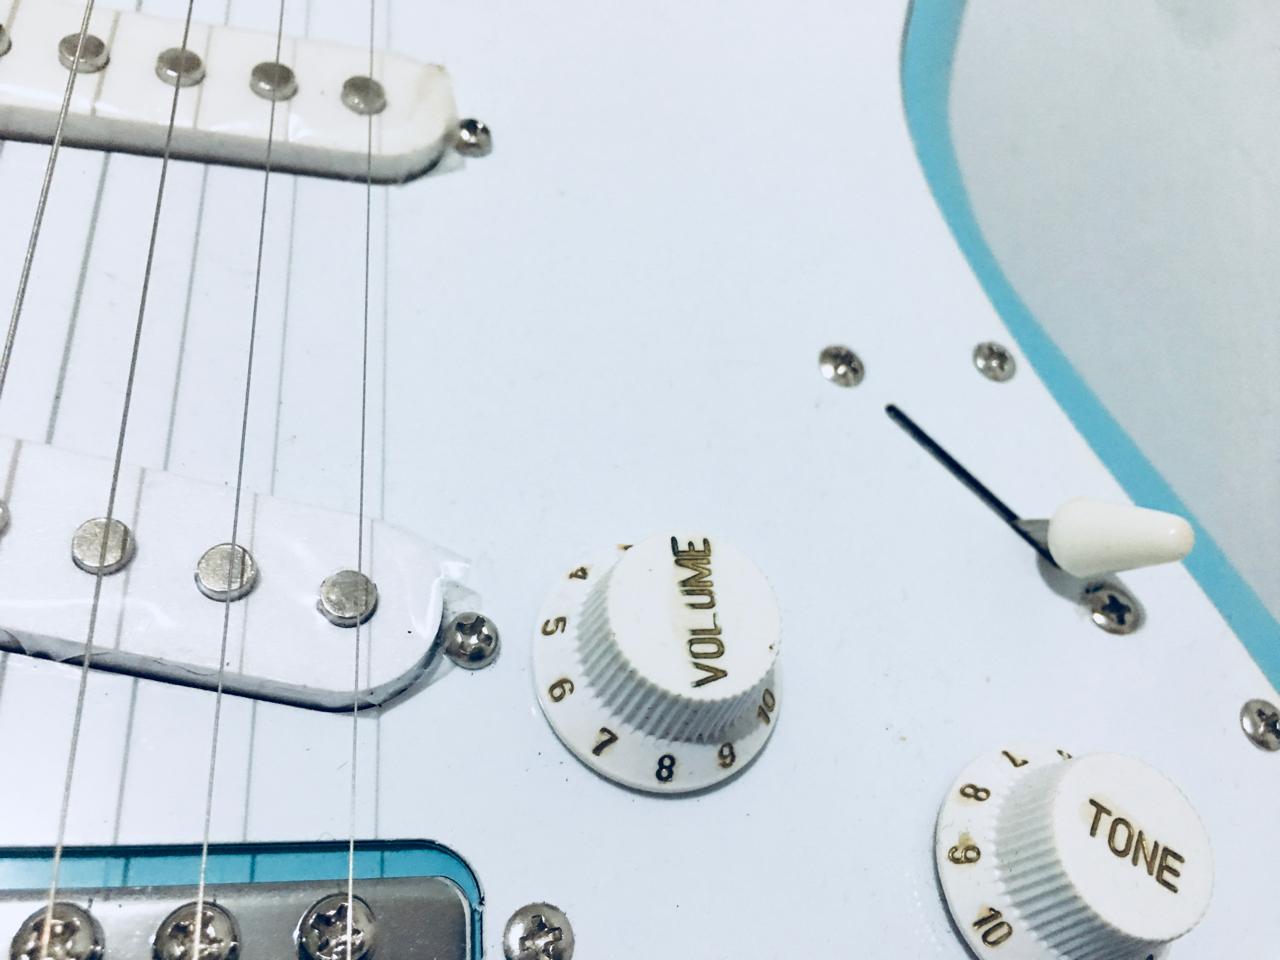 this guitar